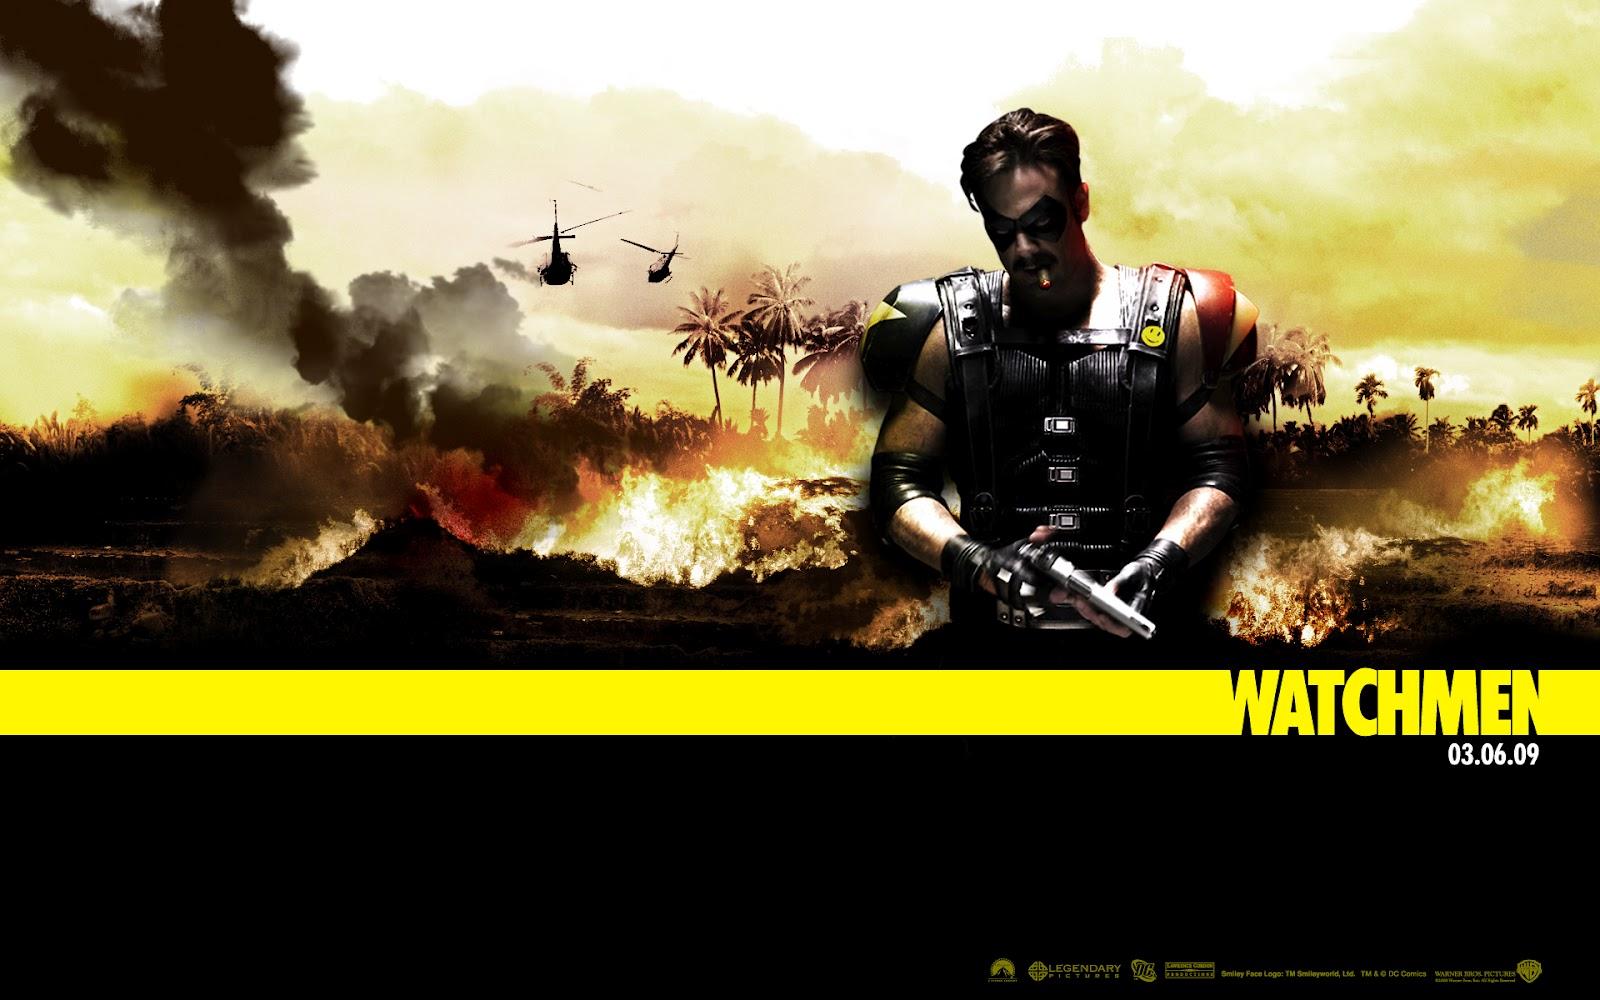 http://1.bp.blogspot.com/-AZobdvpkKF0/T7FihOqDS-I/AAAAAAAAImA/pGBc9hWch-c/s1600/watchmen_movies_poster_vietnam_the_comedian_movie_desktop_1920x1200_wallpaper-116014.jpeg